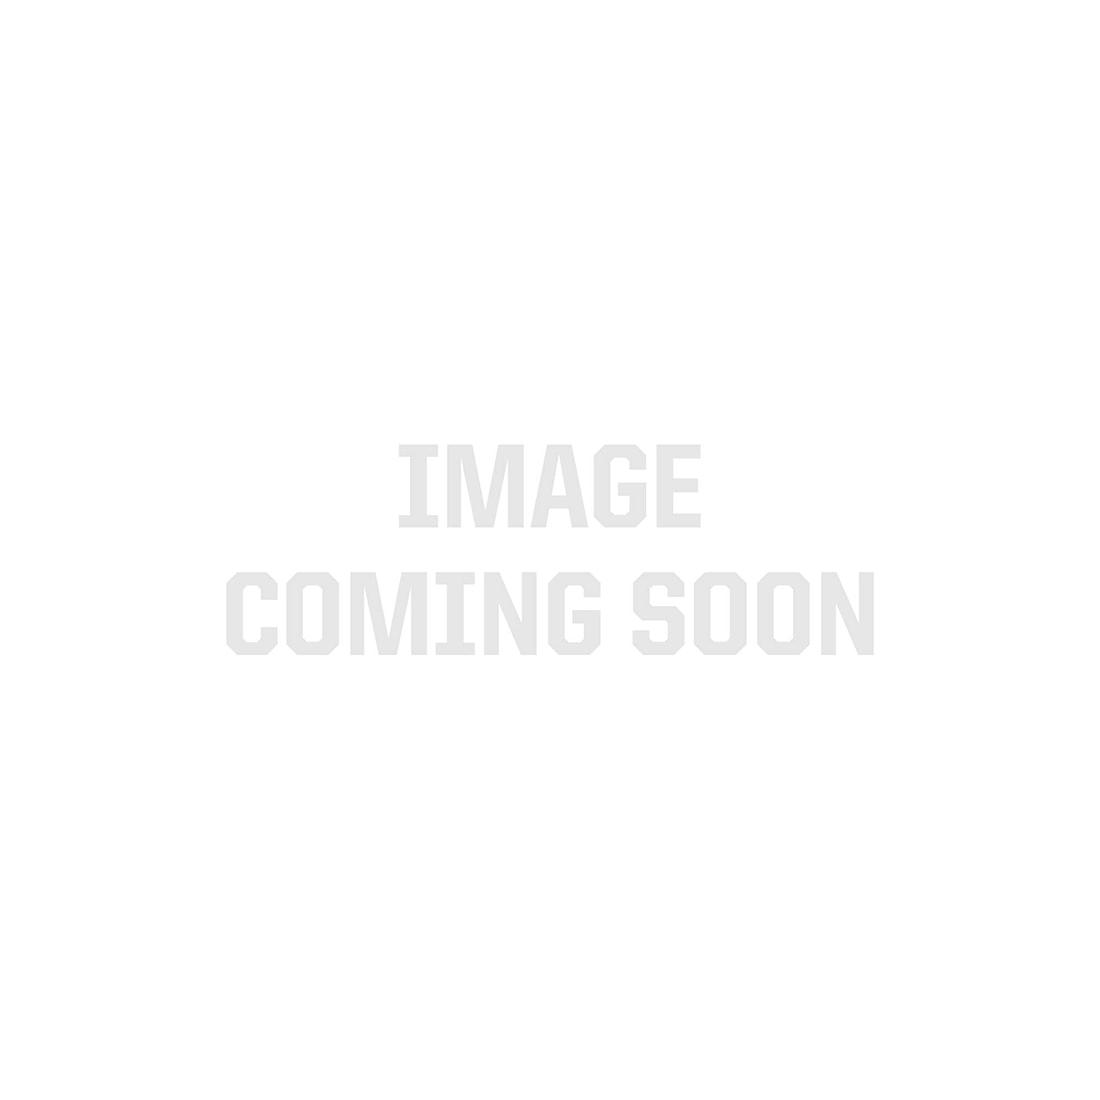 Waterproof Amber 3528 Single Row LED Strip Light, 120/m, 10mm wide, by the 5m Reel